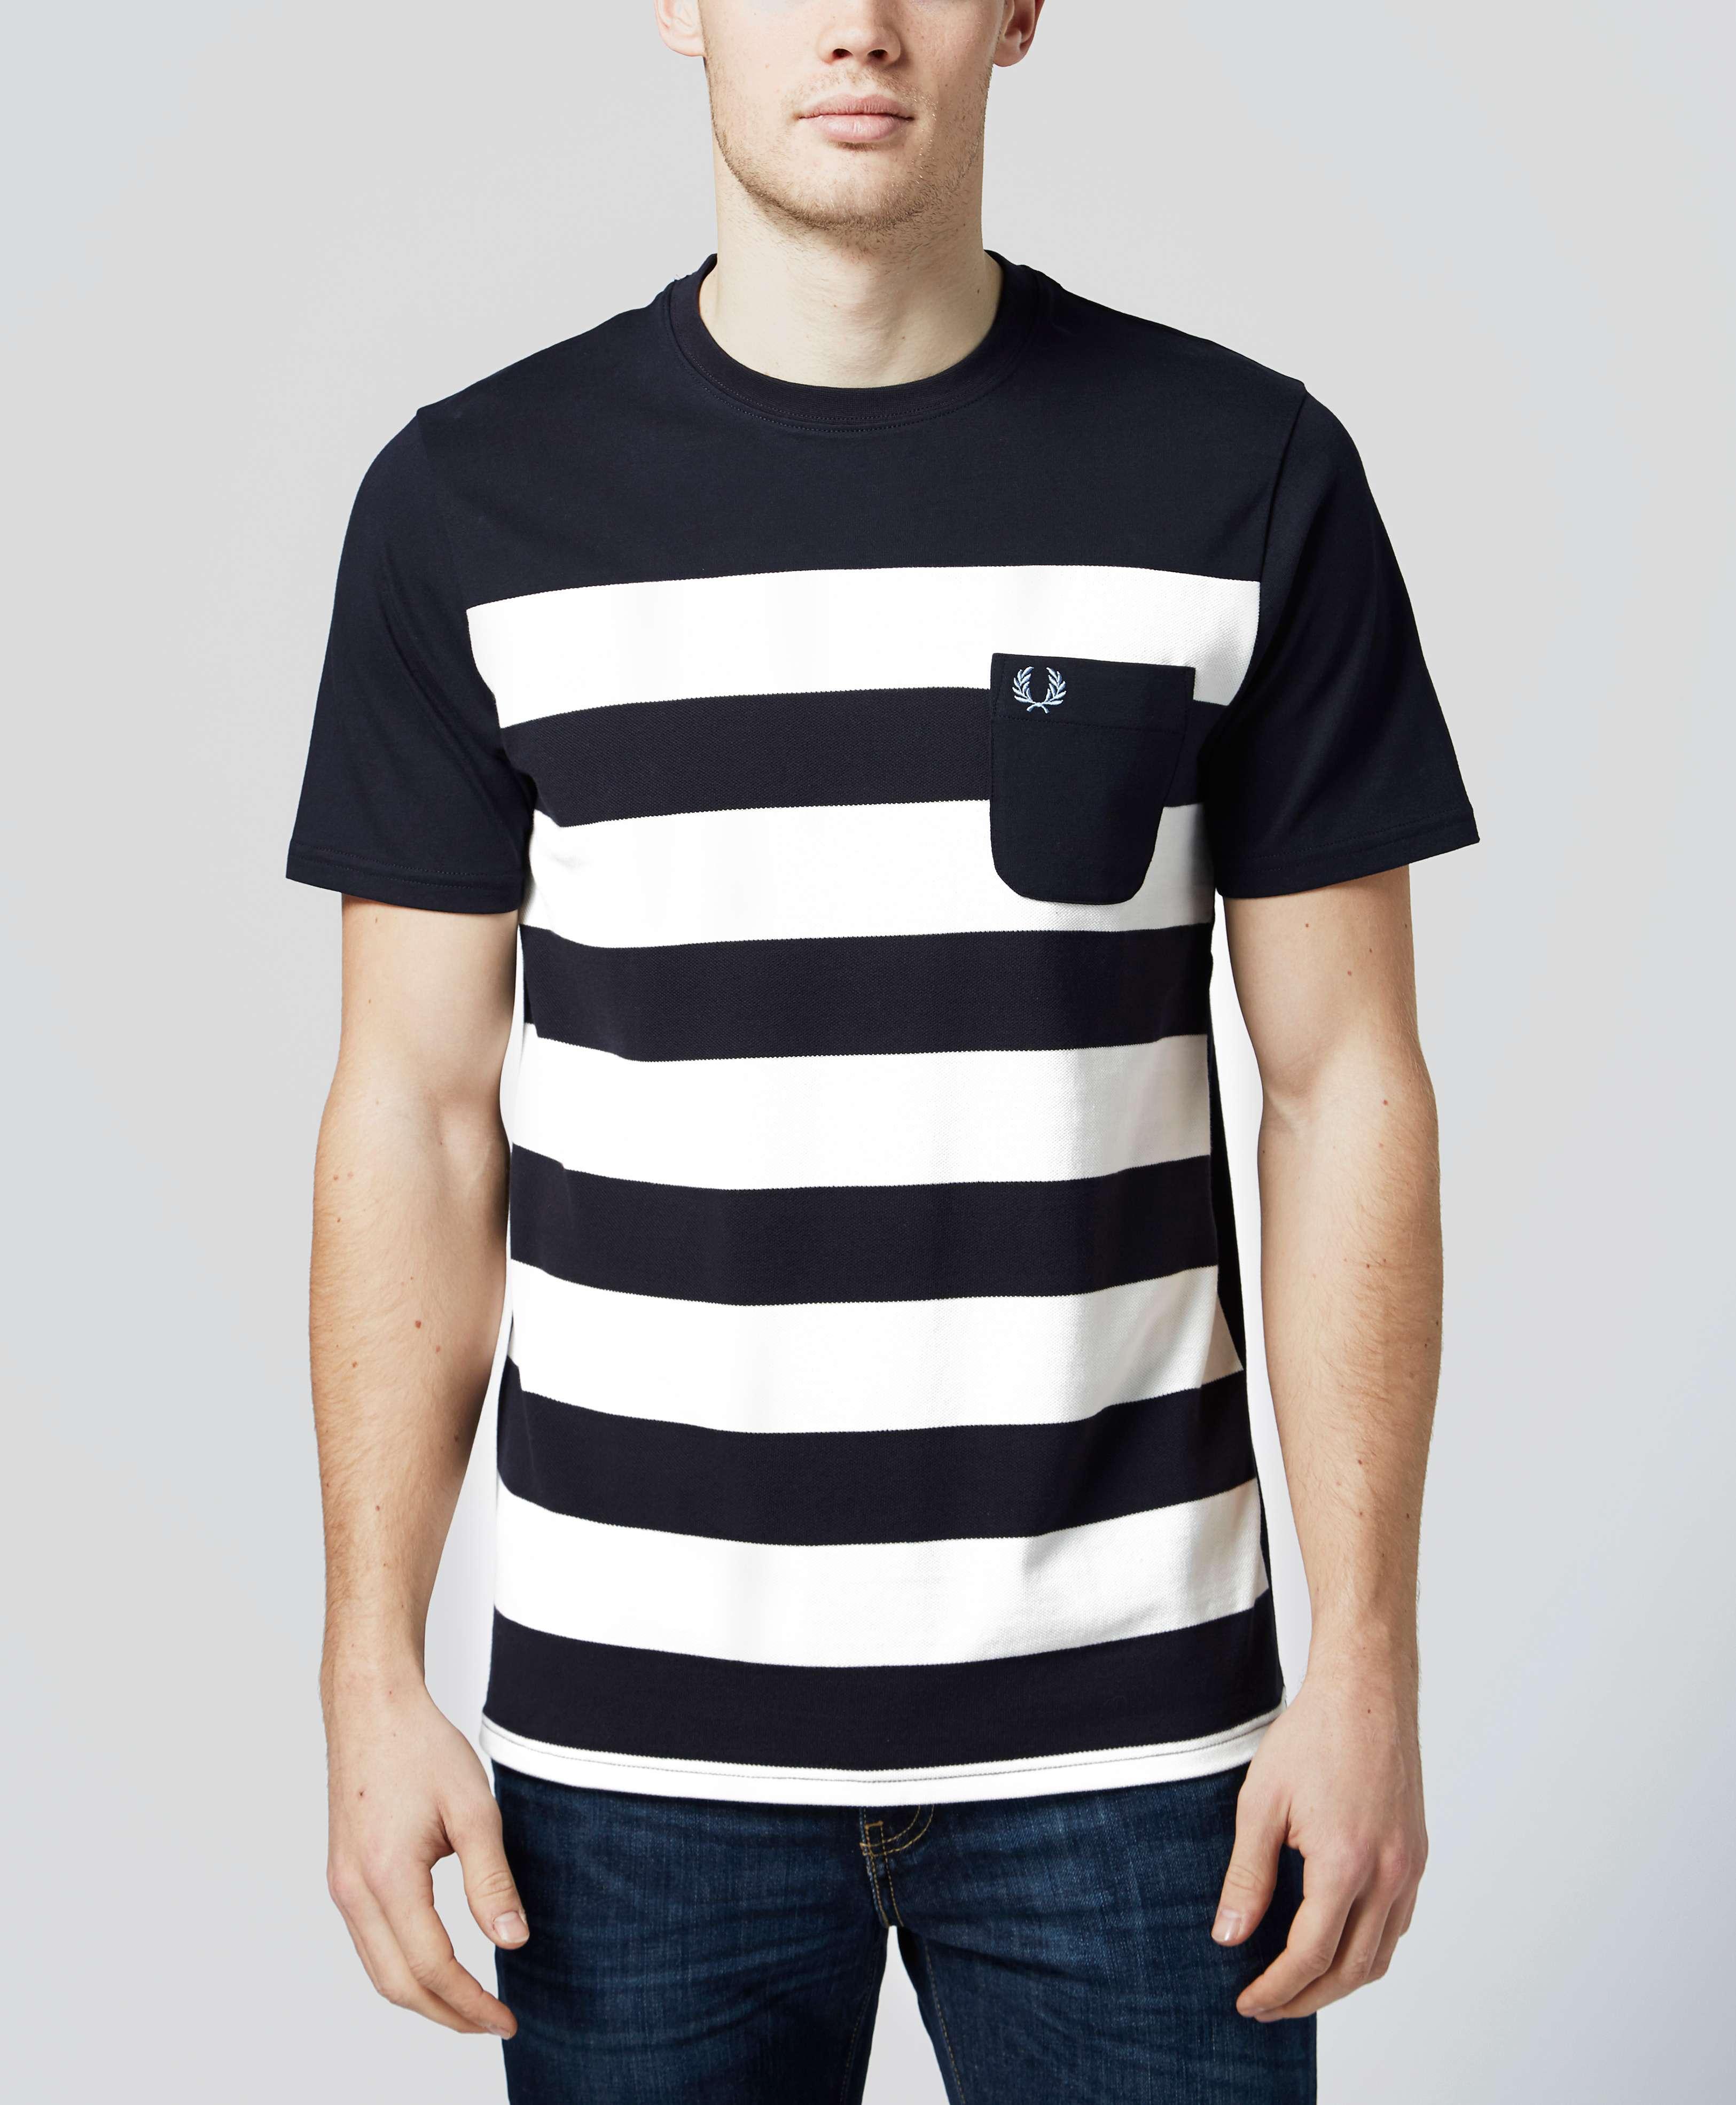 Fred Perry Pique Stripe T Shirt Scotts Menswear